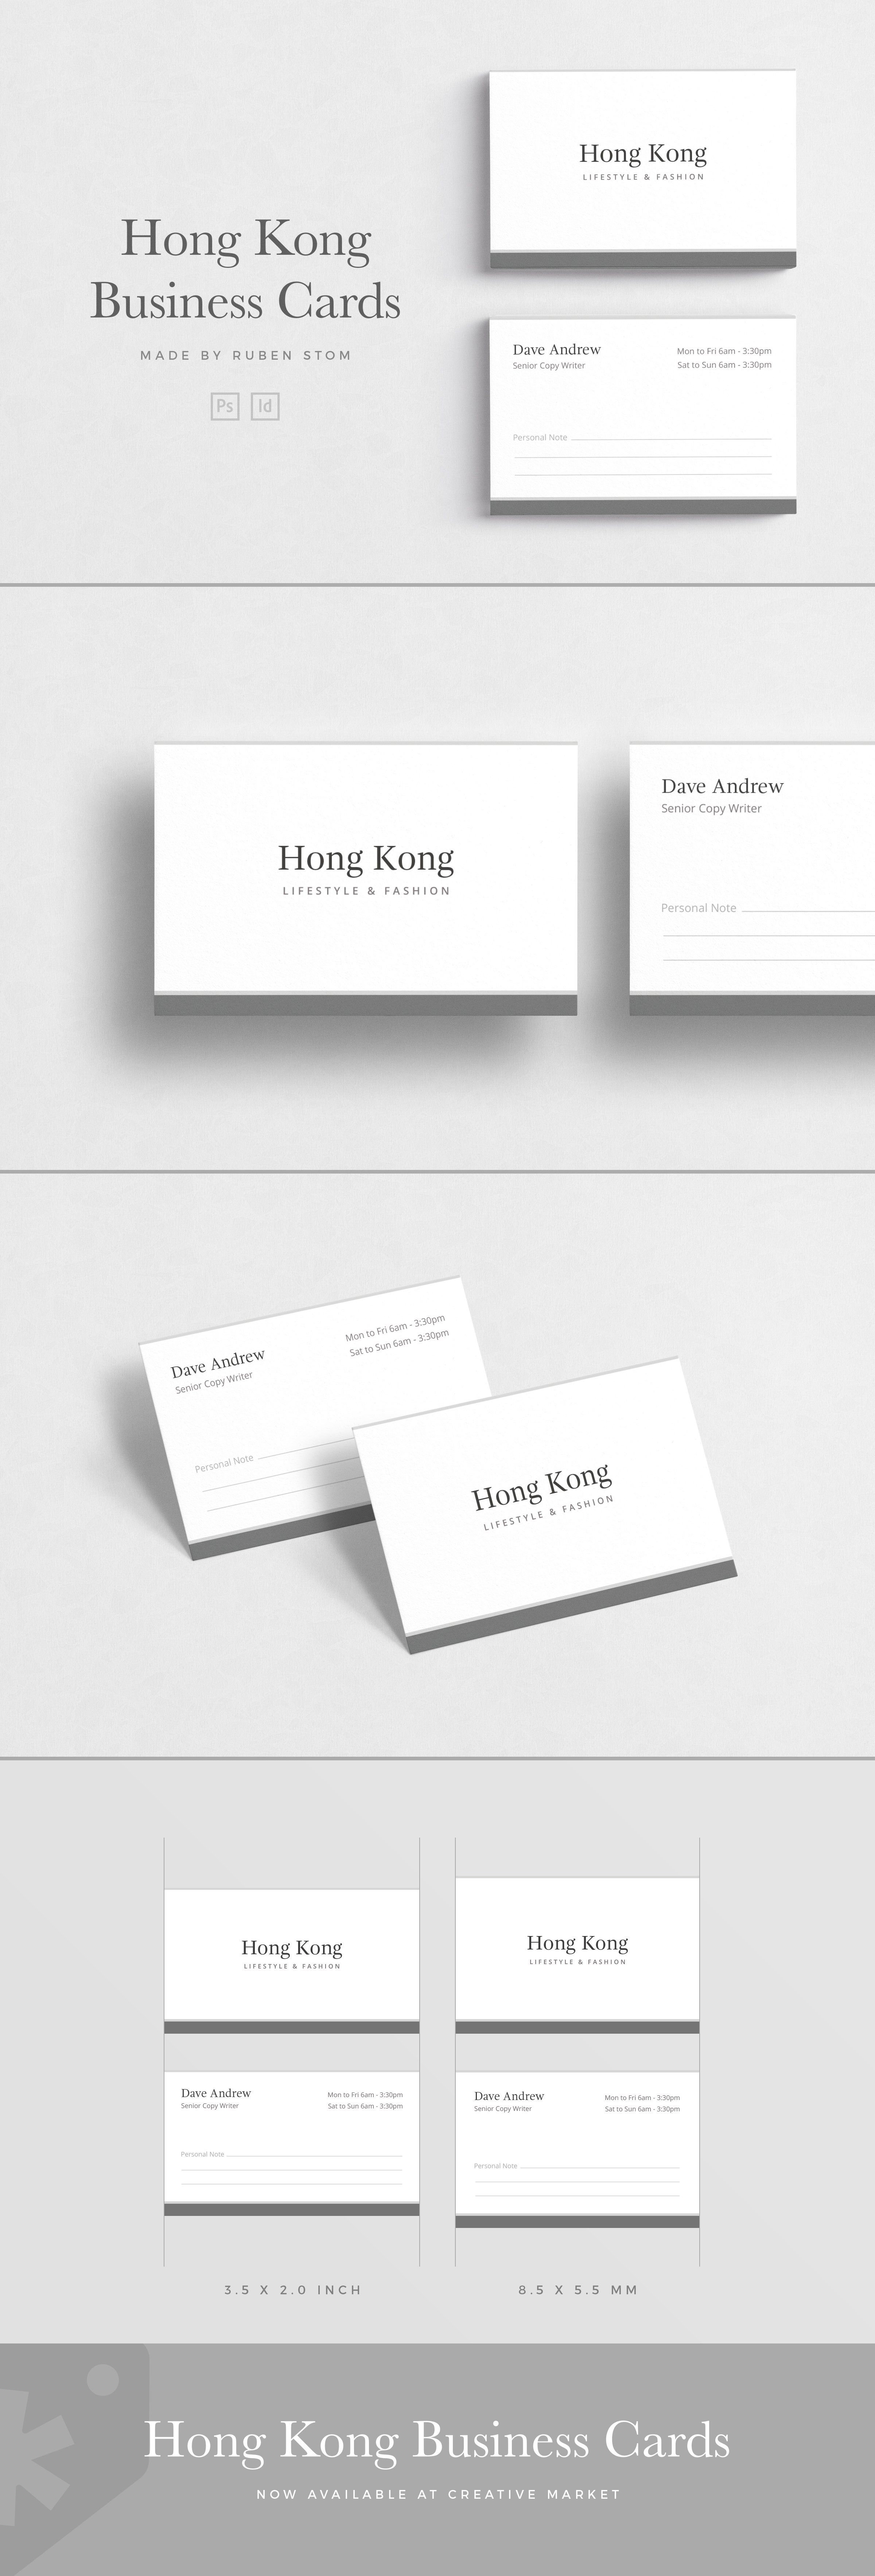 Hong Kong Business Card Elegant Business Cards Customizable Business Cards Templates Business Cards